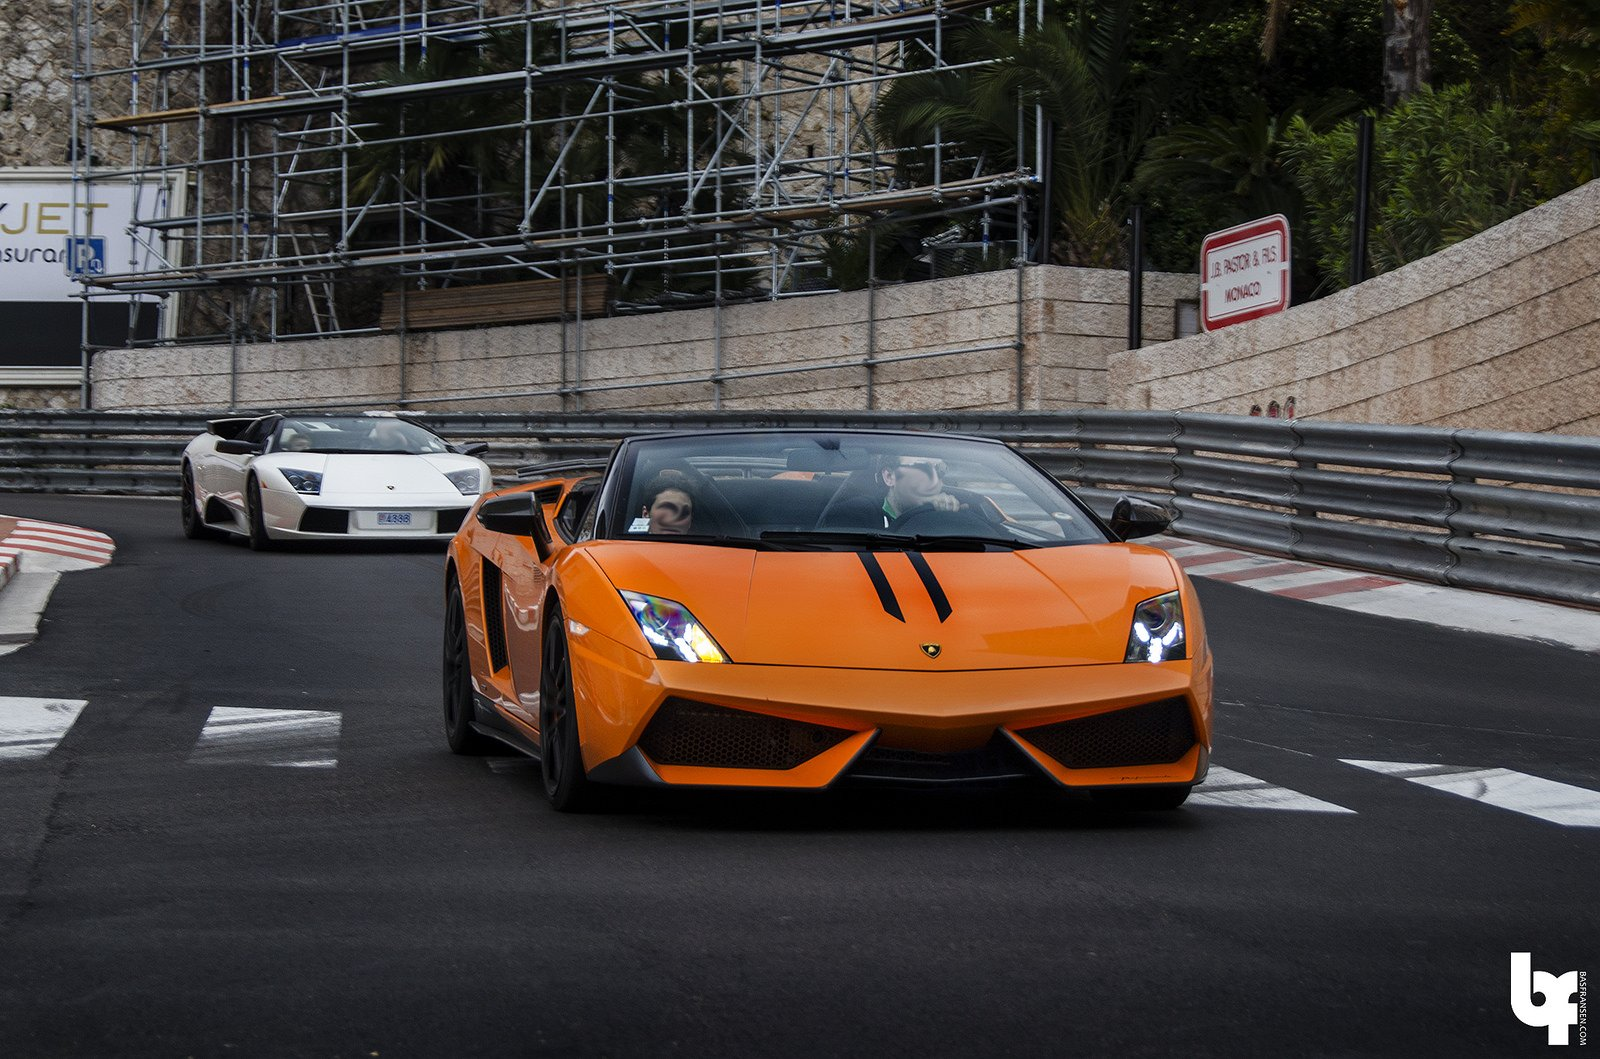 Lamborghini Gallardo Convertible Orange Lamborghini gallardo lp570-4